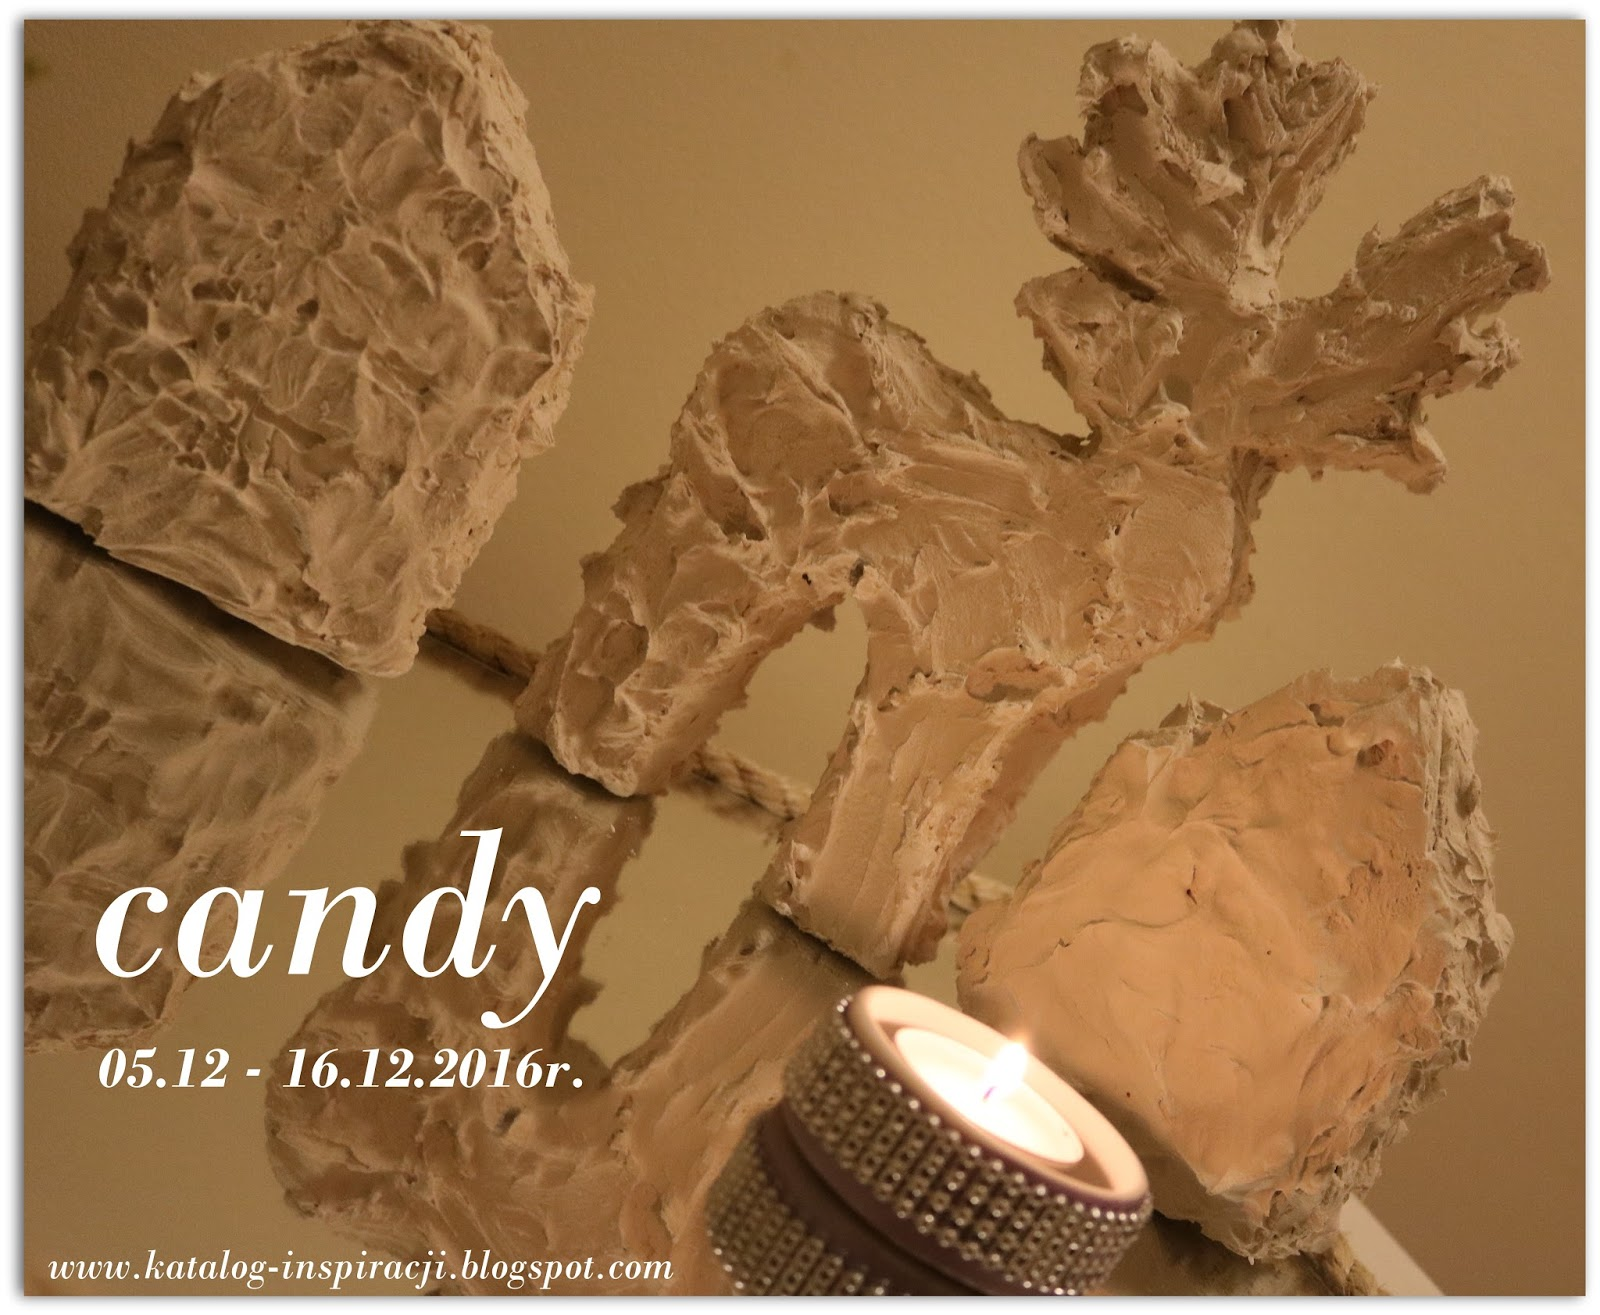 Candy u Katalog Inspiracji